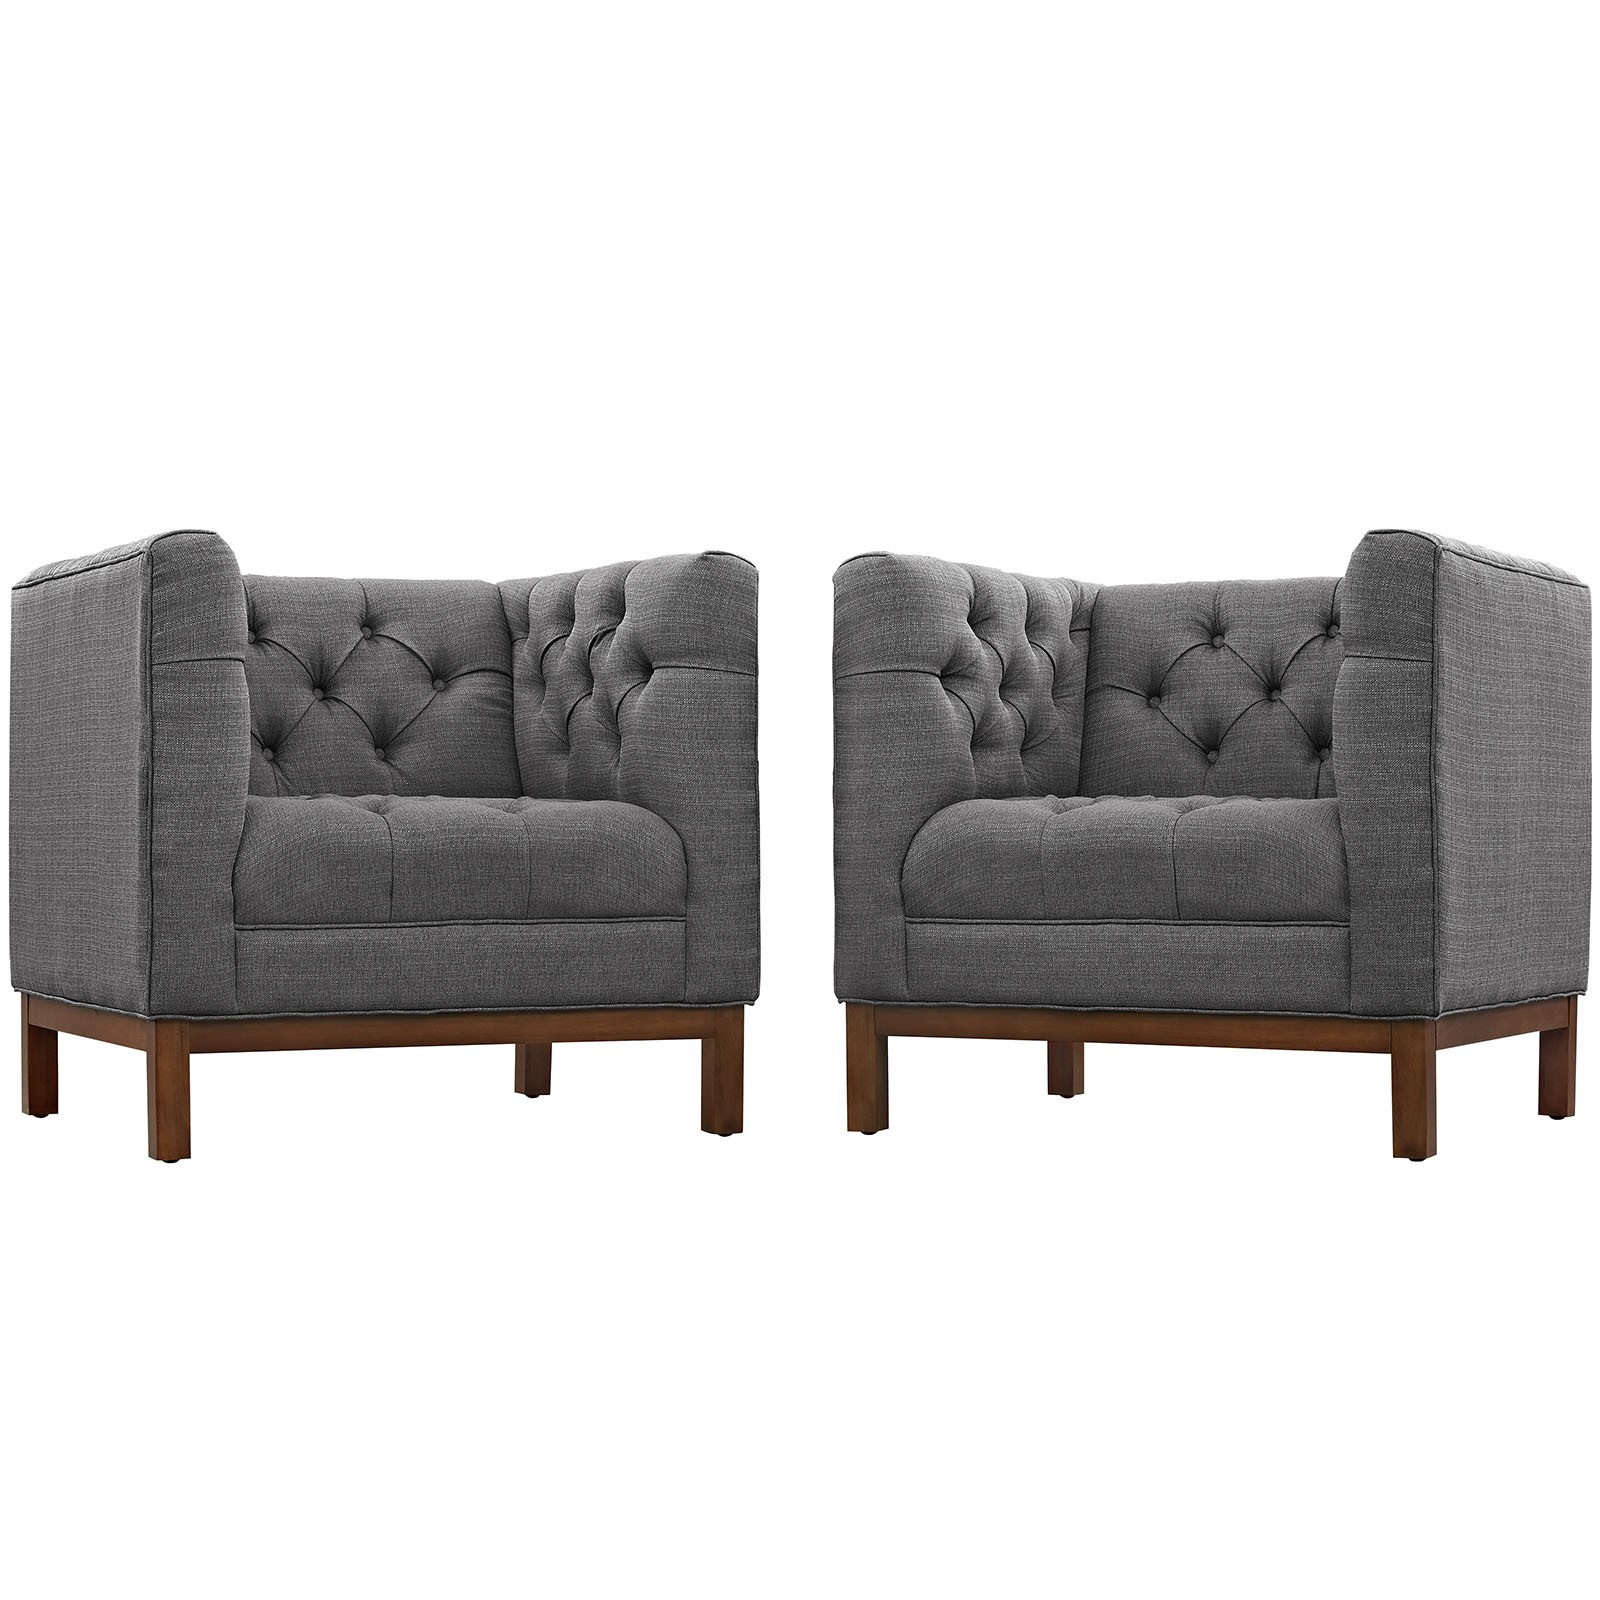 Panache Living Room Set Fabric Set of 2